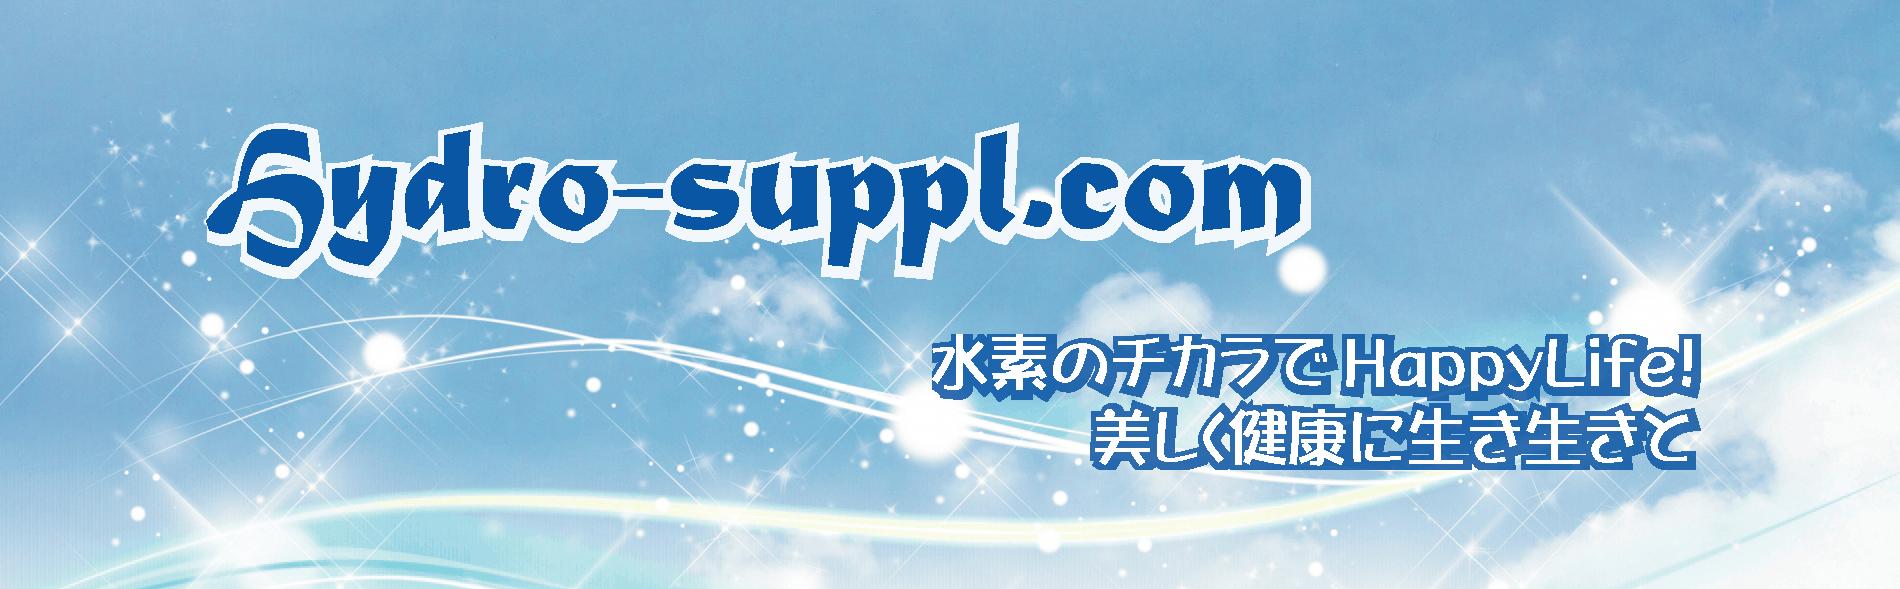 "<img src=""画像URL"" alt=""hydro-suppl.com"" />"